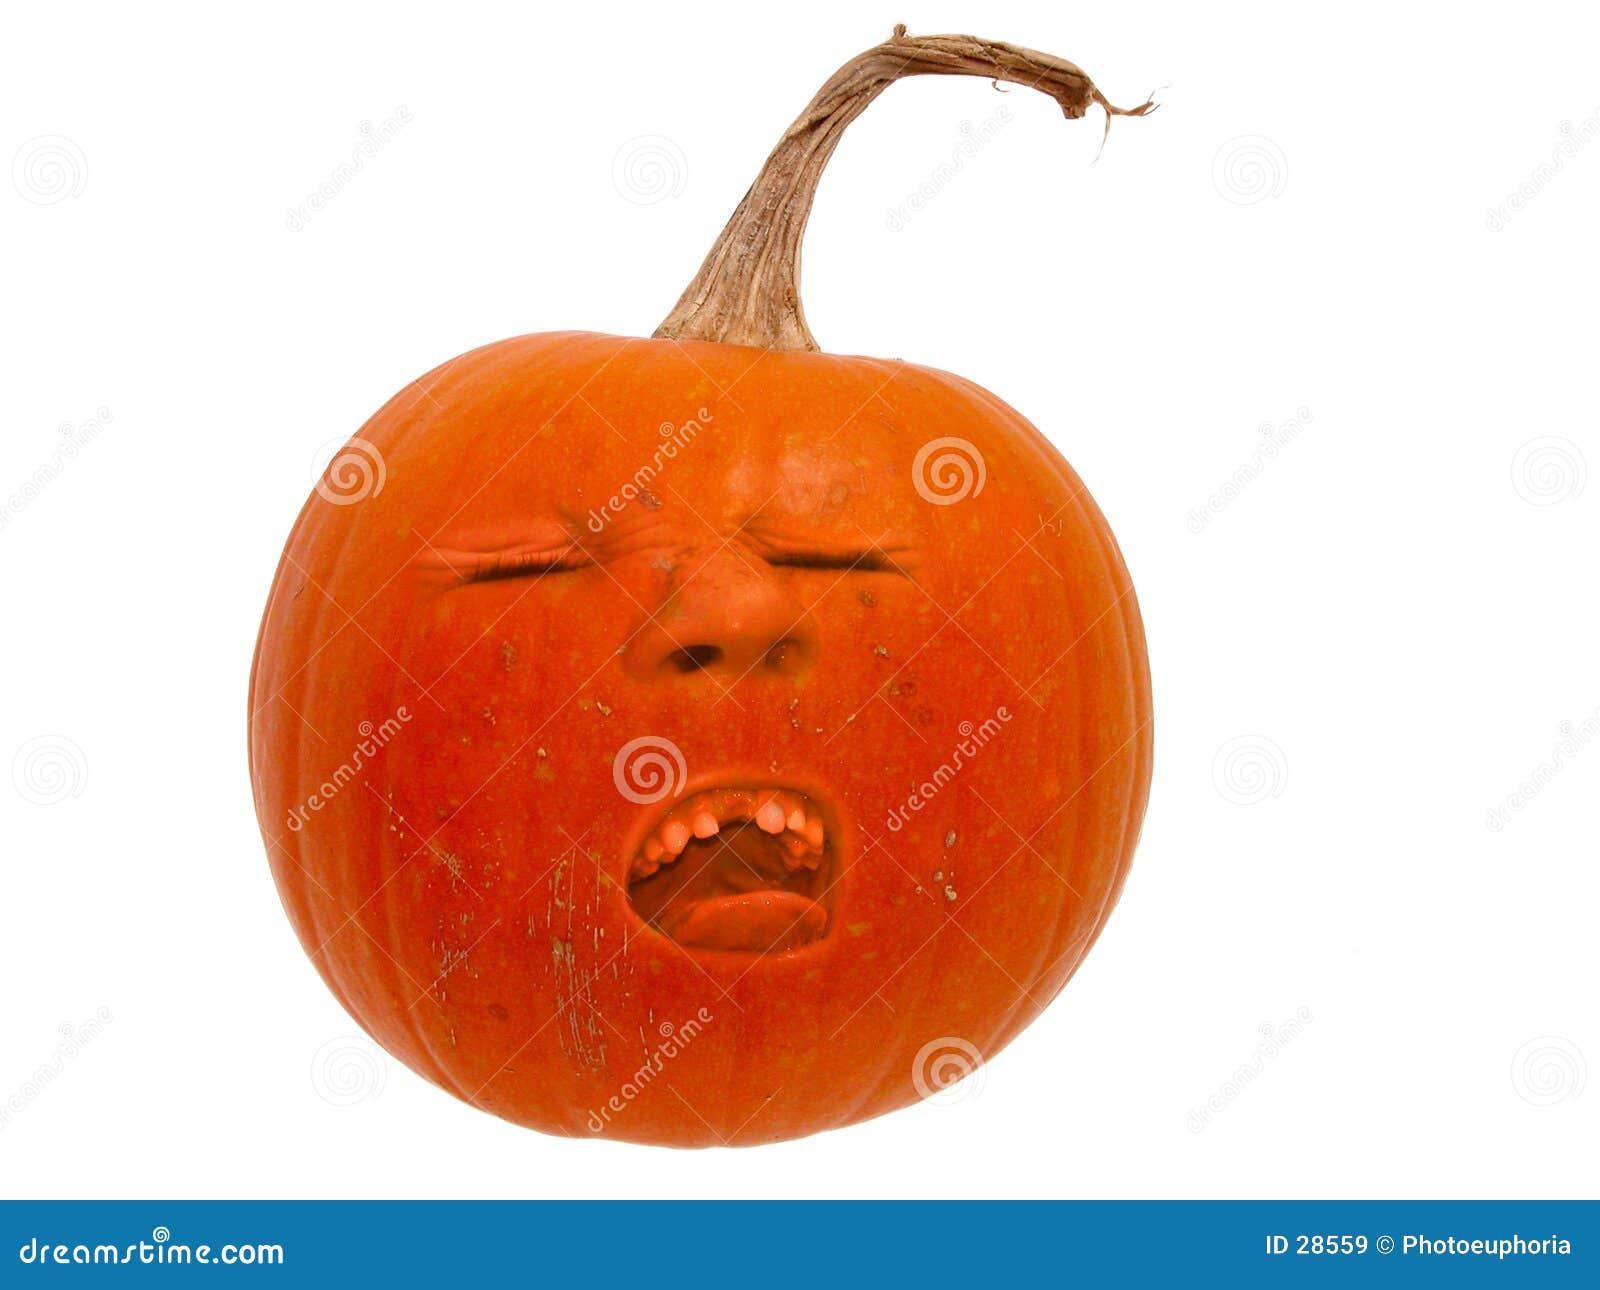 Pumpkin Head (2 of 2)